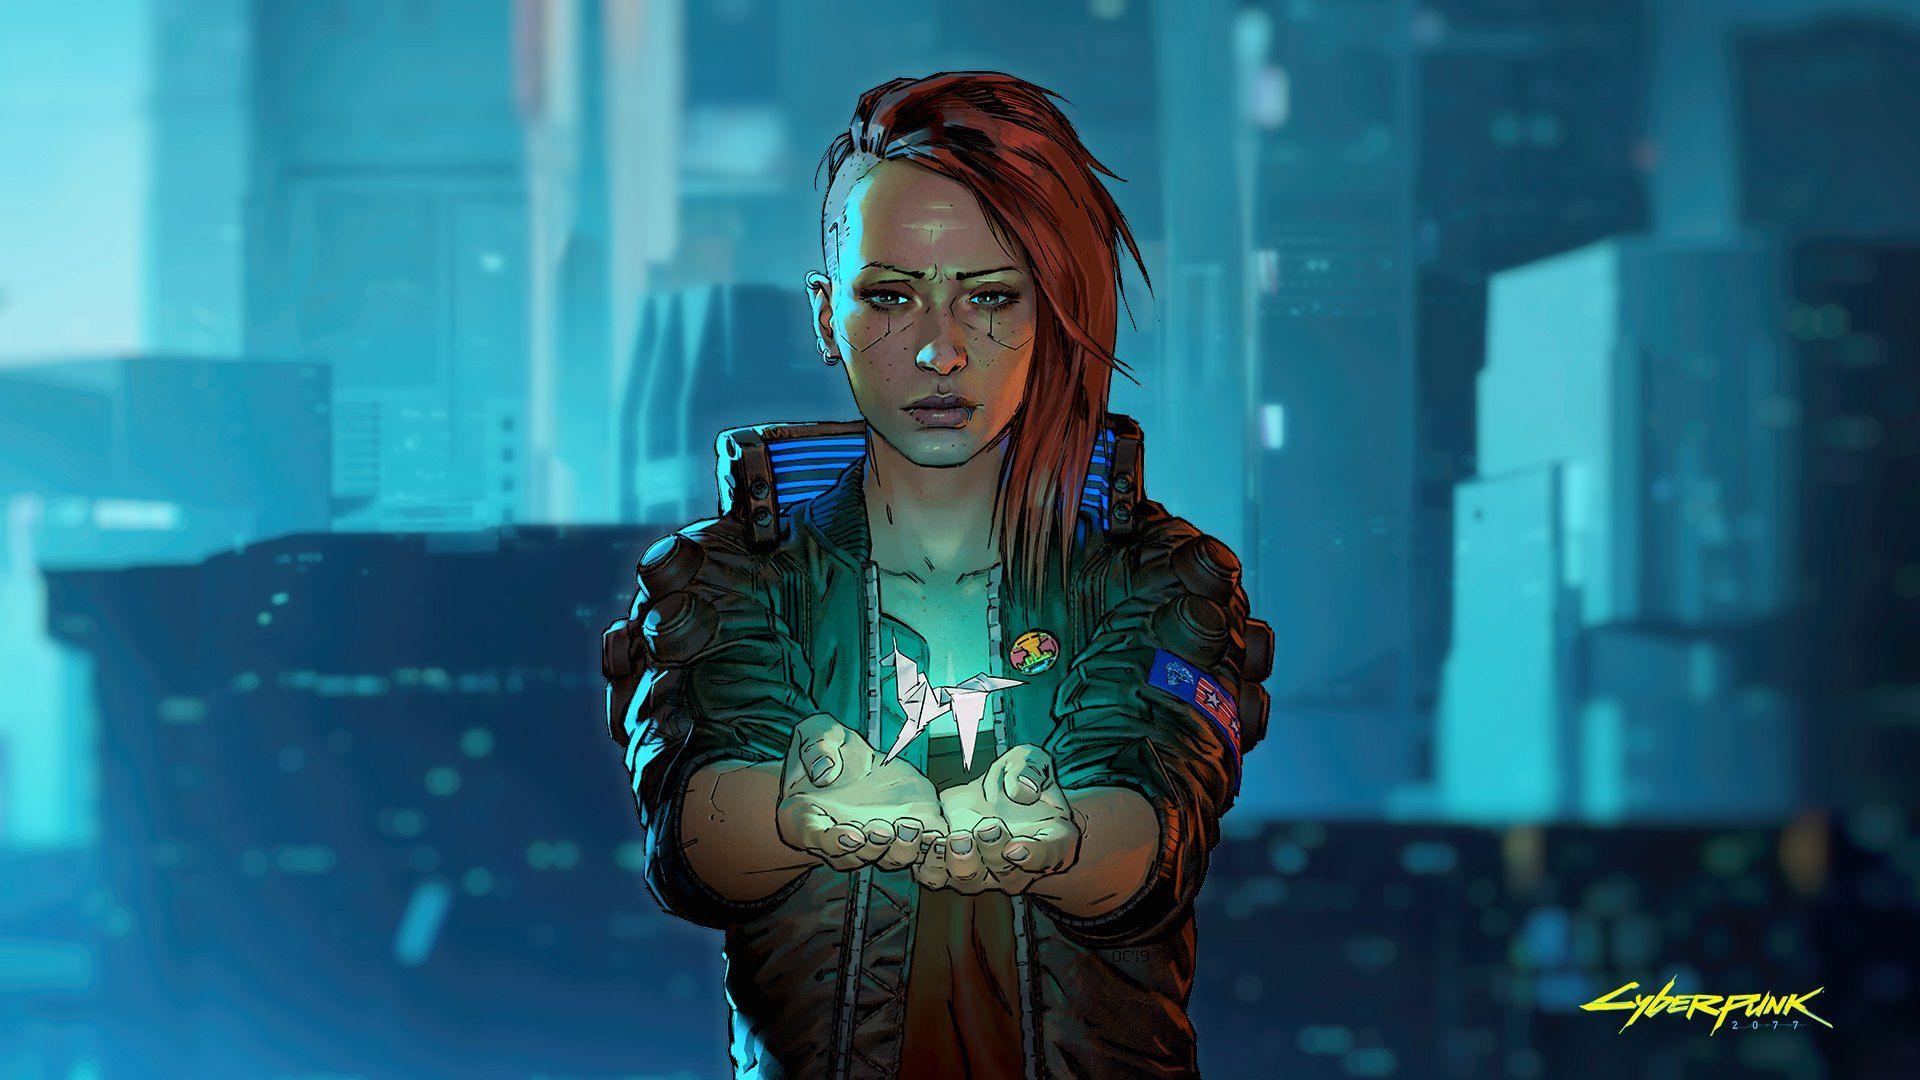 cyberpunk aesthetic wallpaper